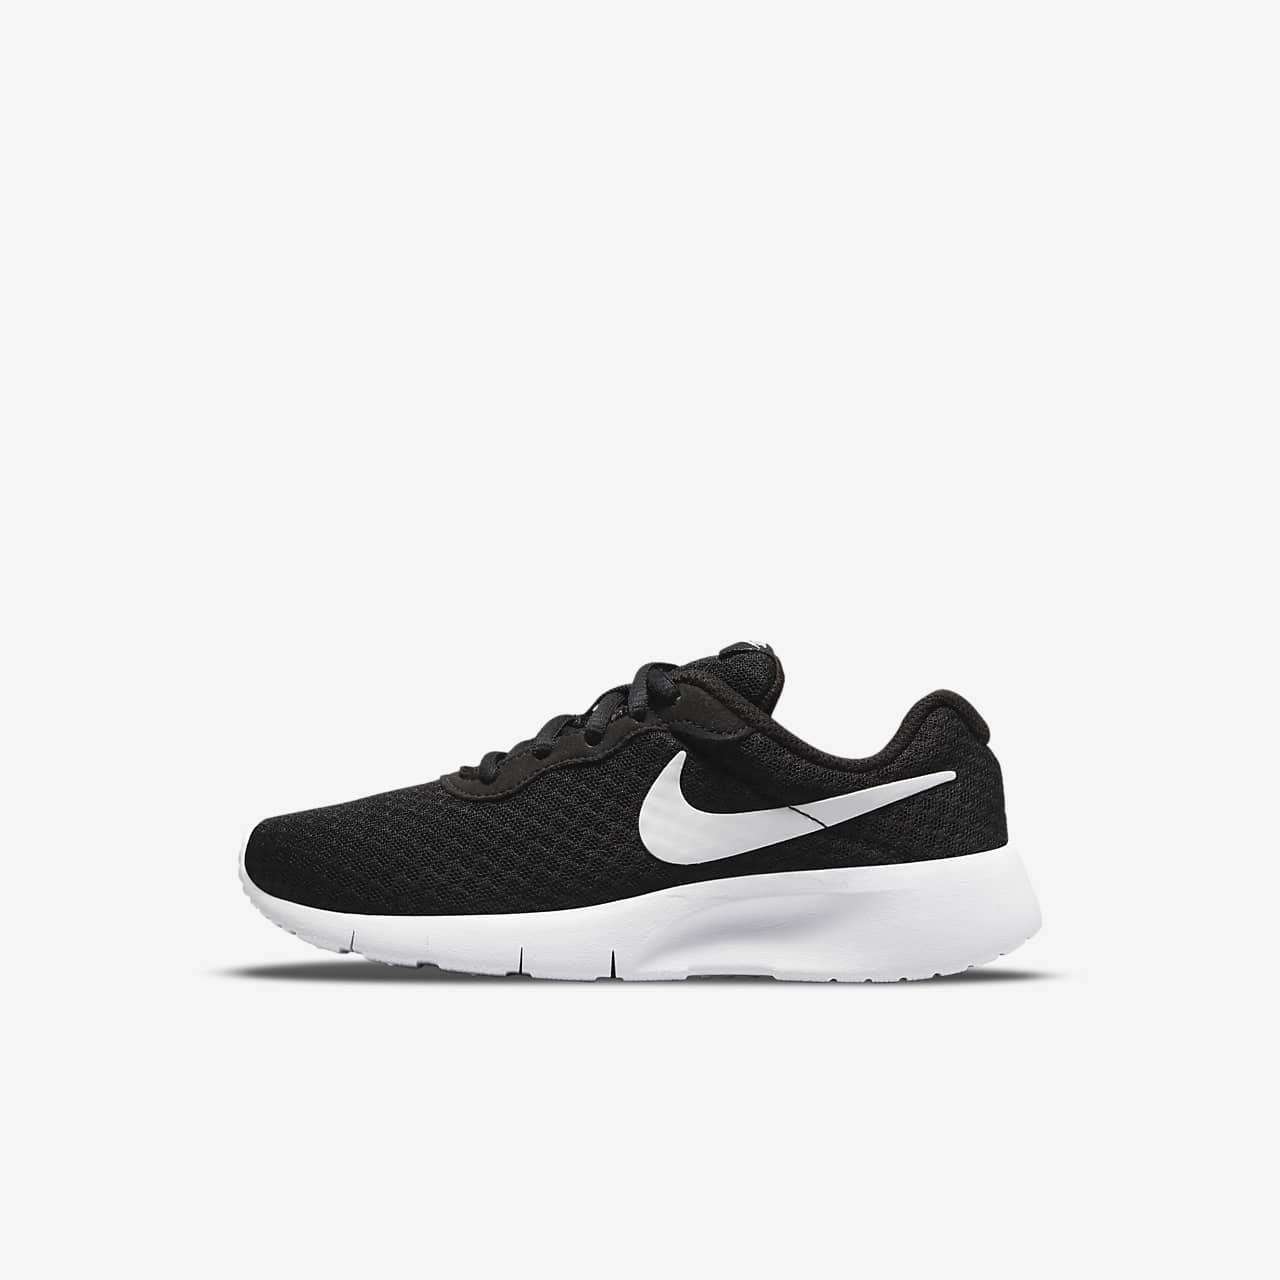 Sko Nike Tanjun för barn